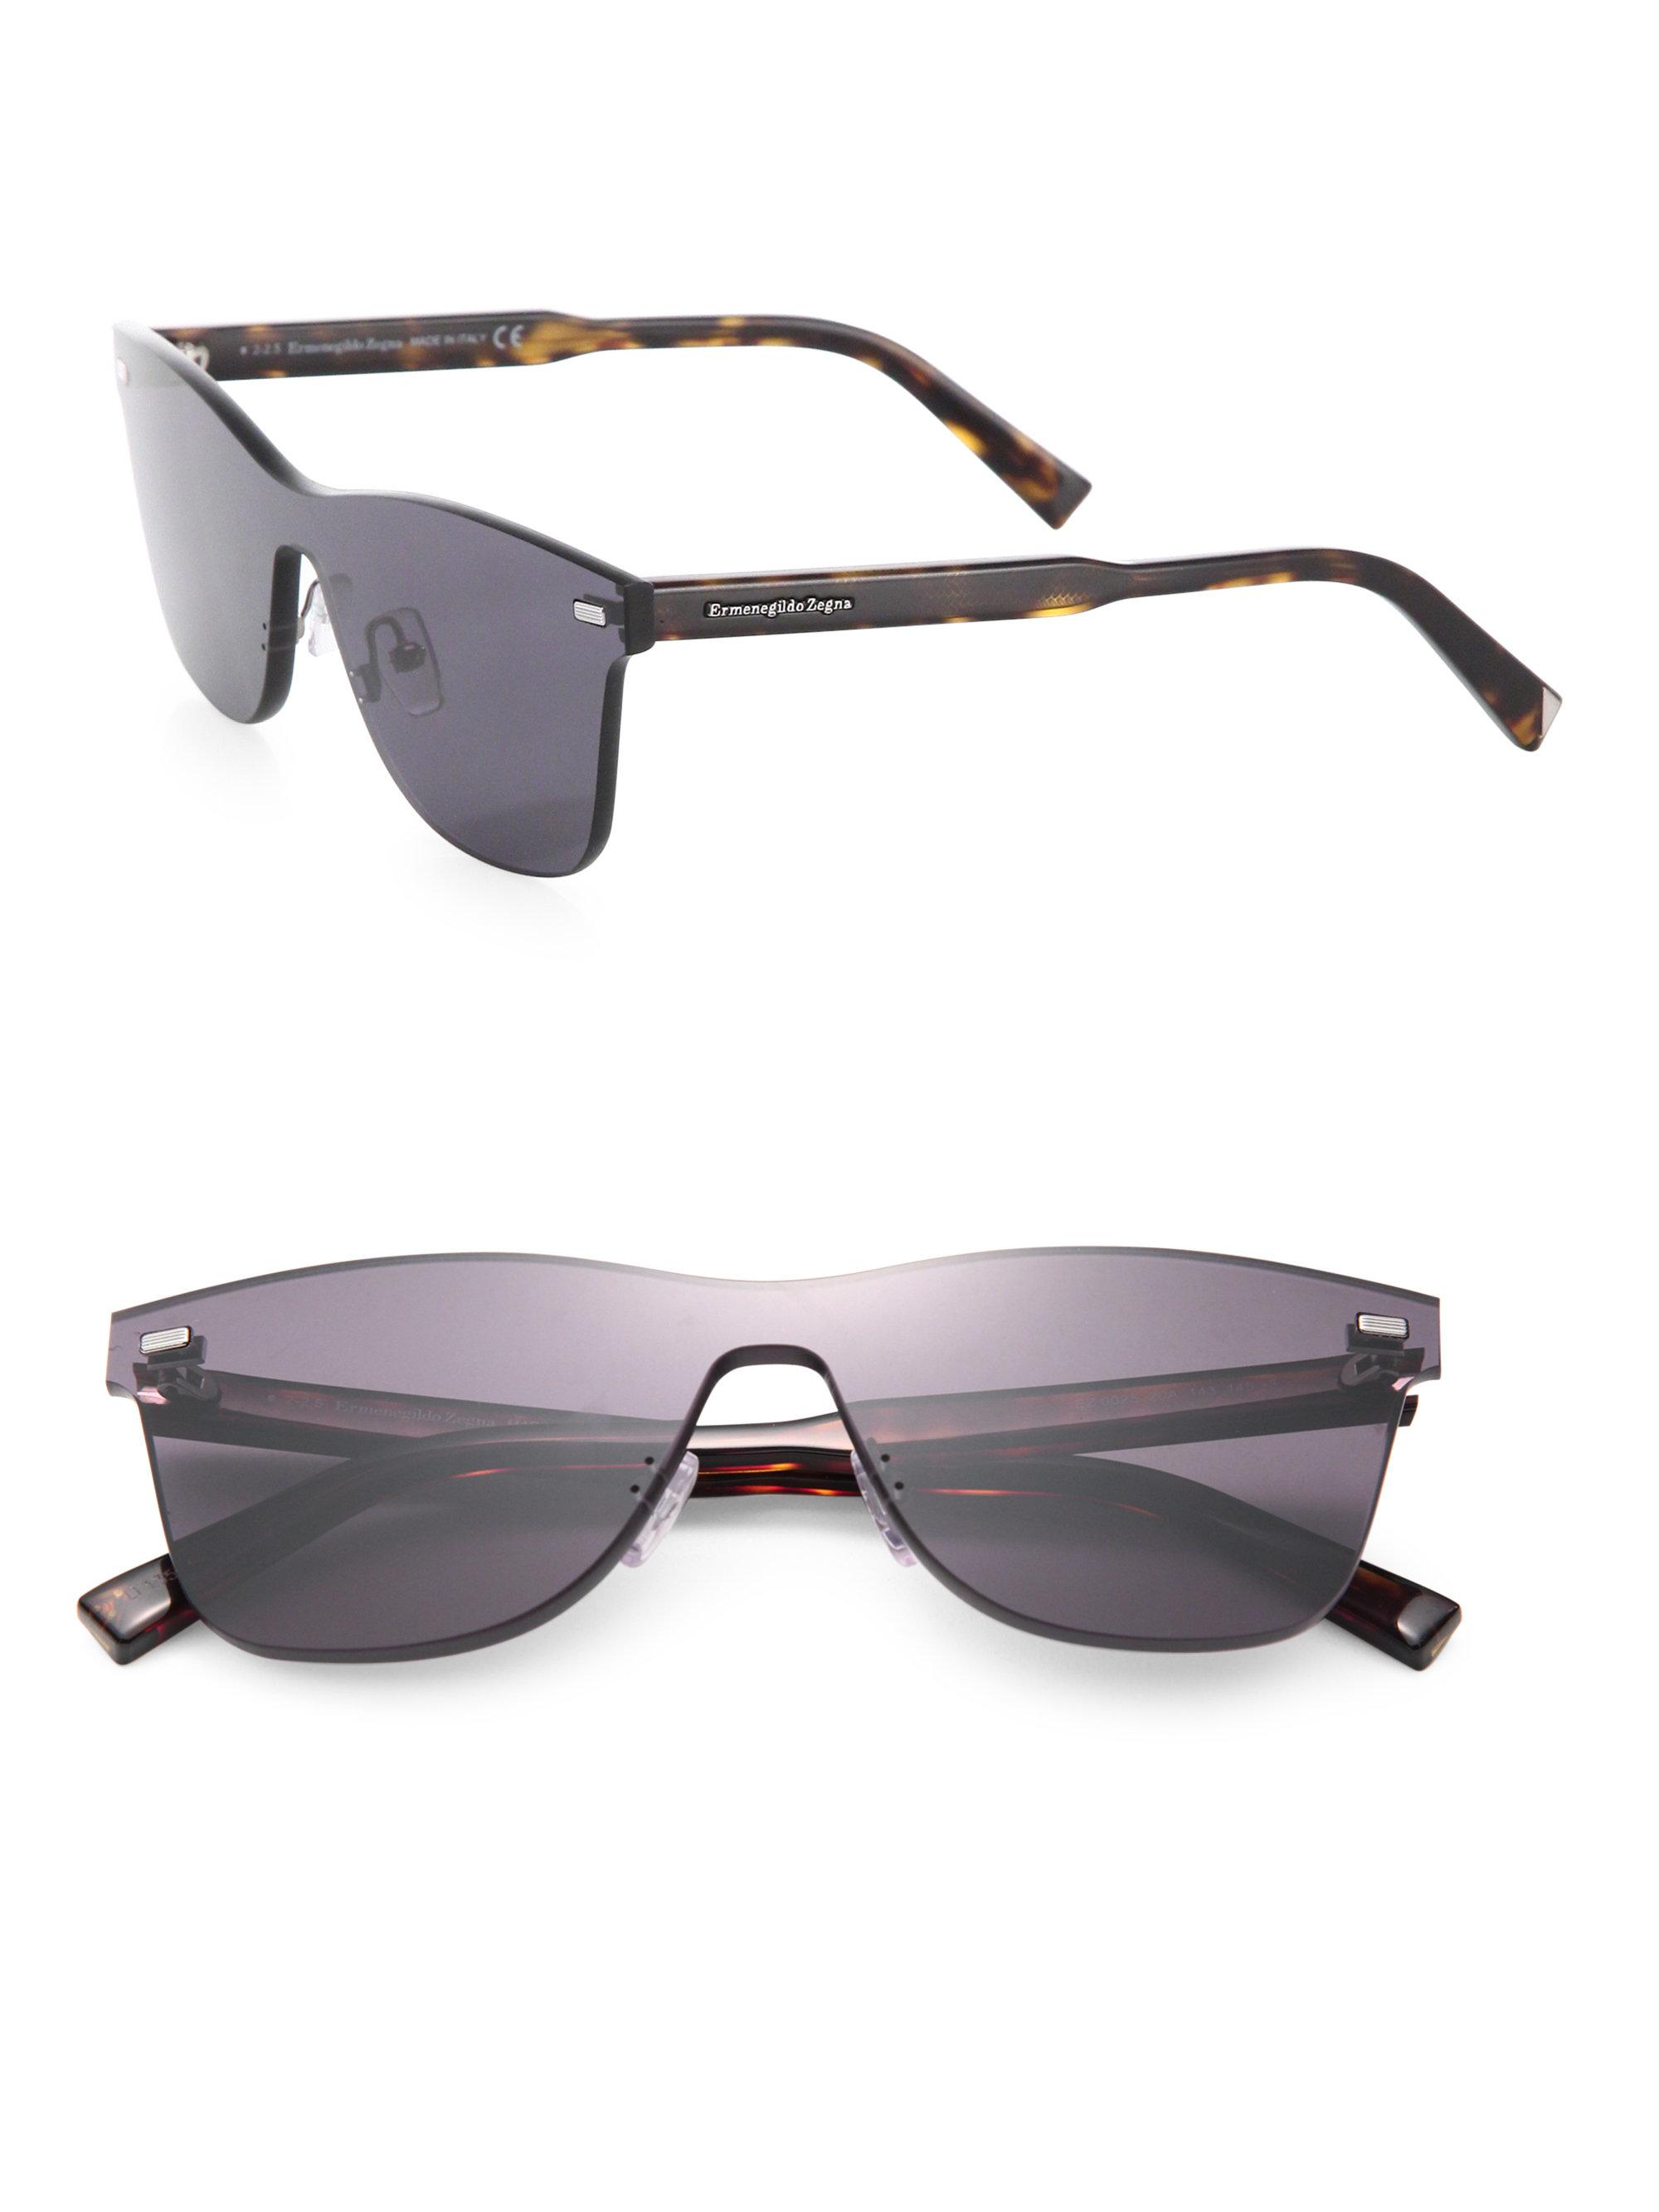 0b24cf25c1 Lyst - Ermenegildo Zegna 143mm Shield Sunglasses in Black for Men